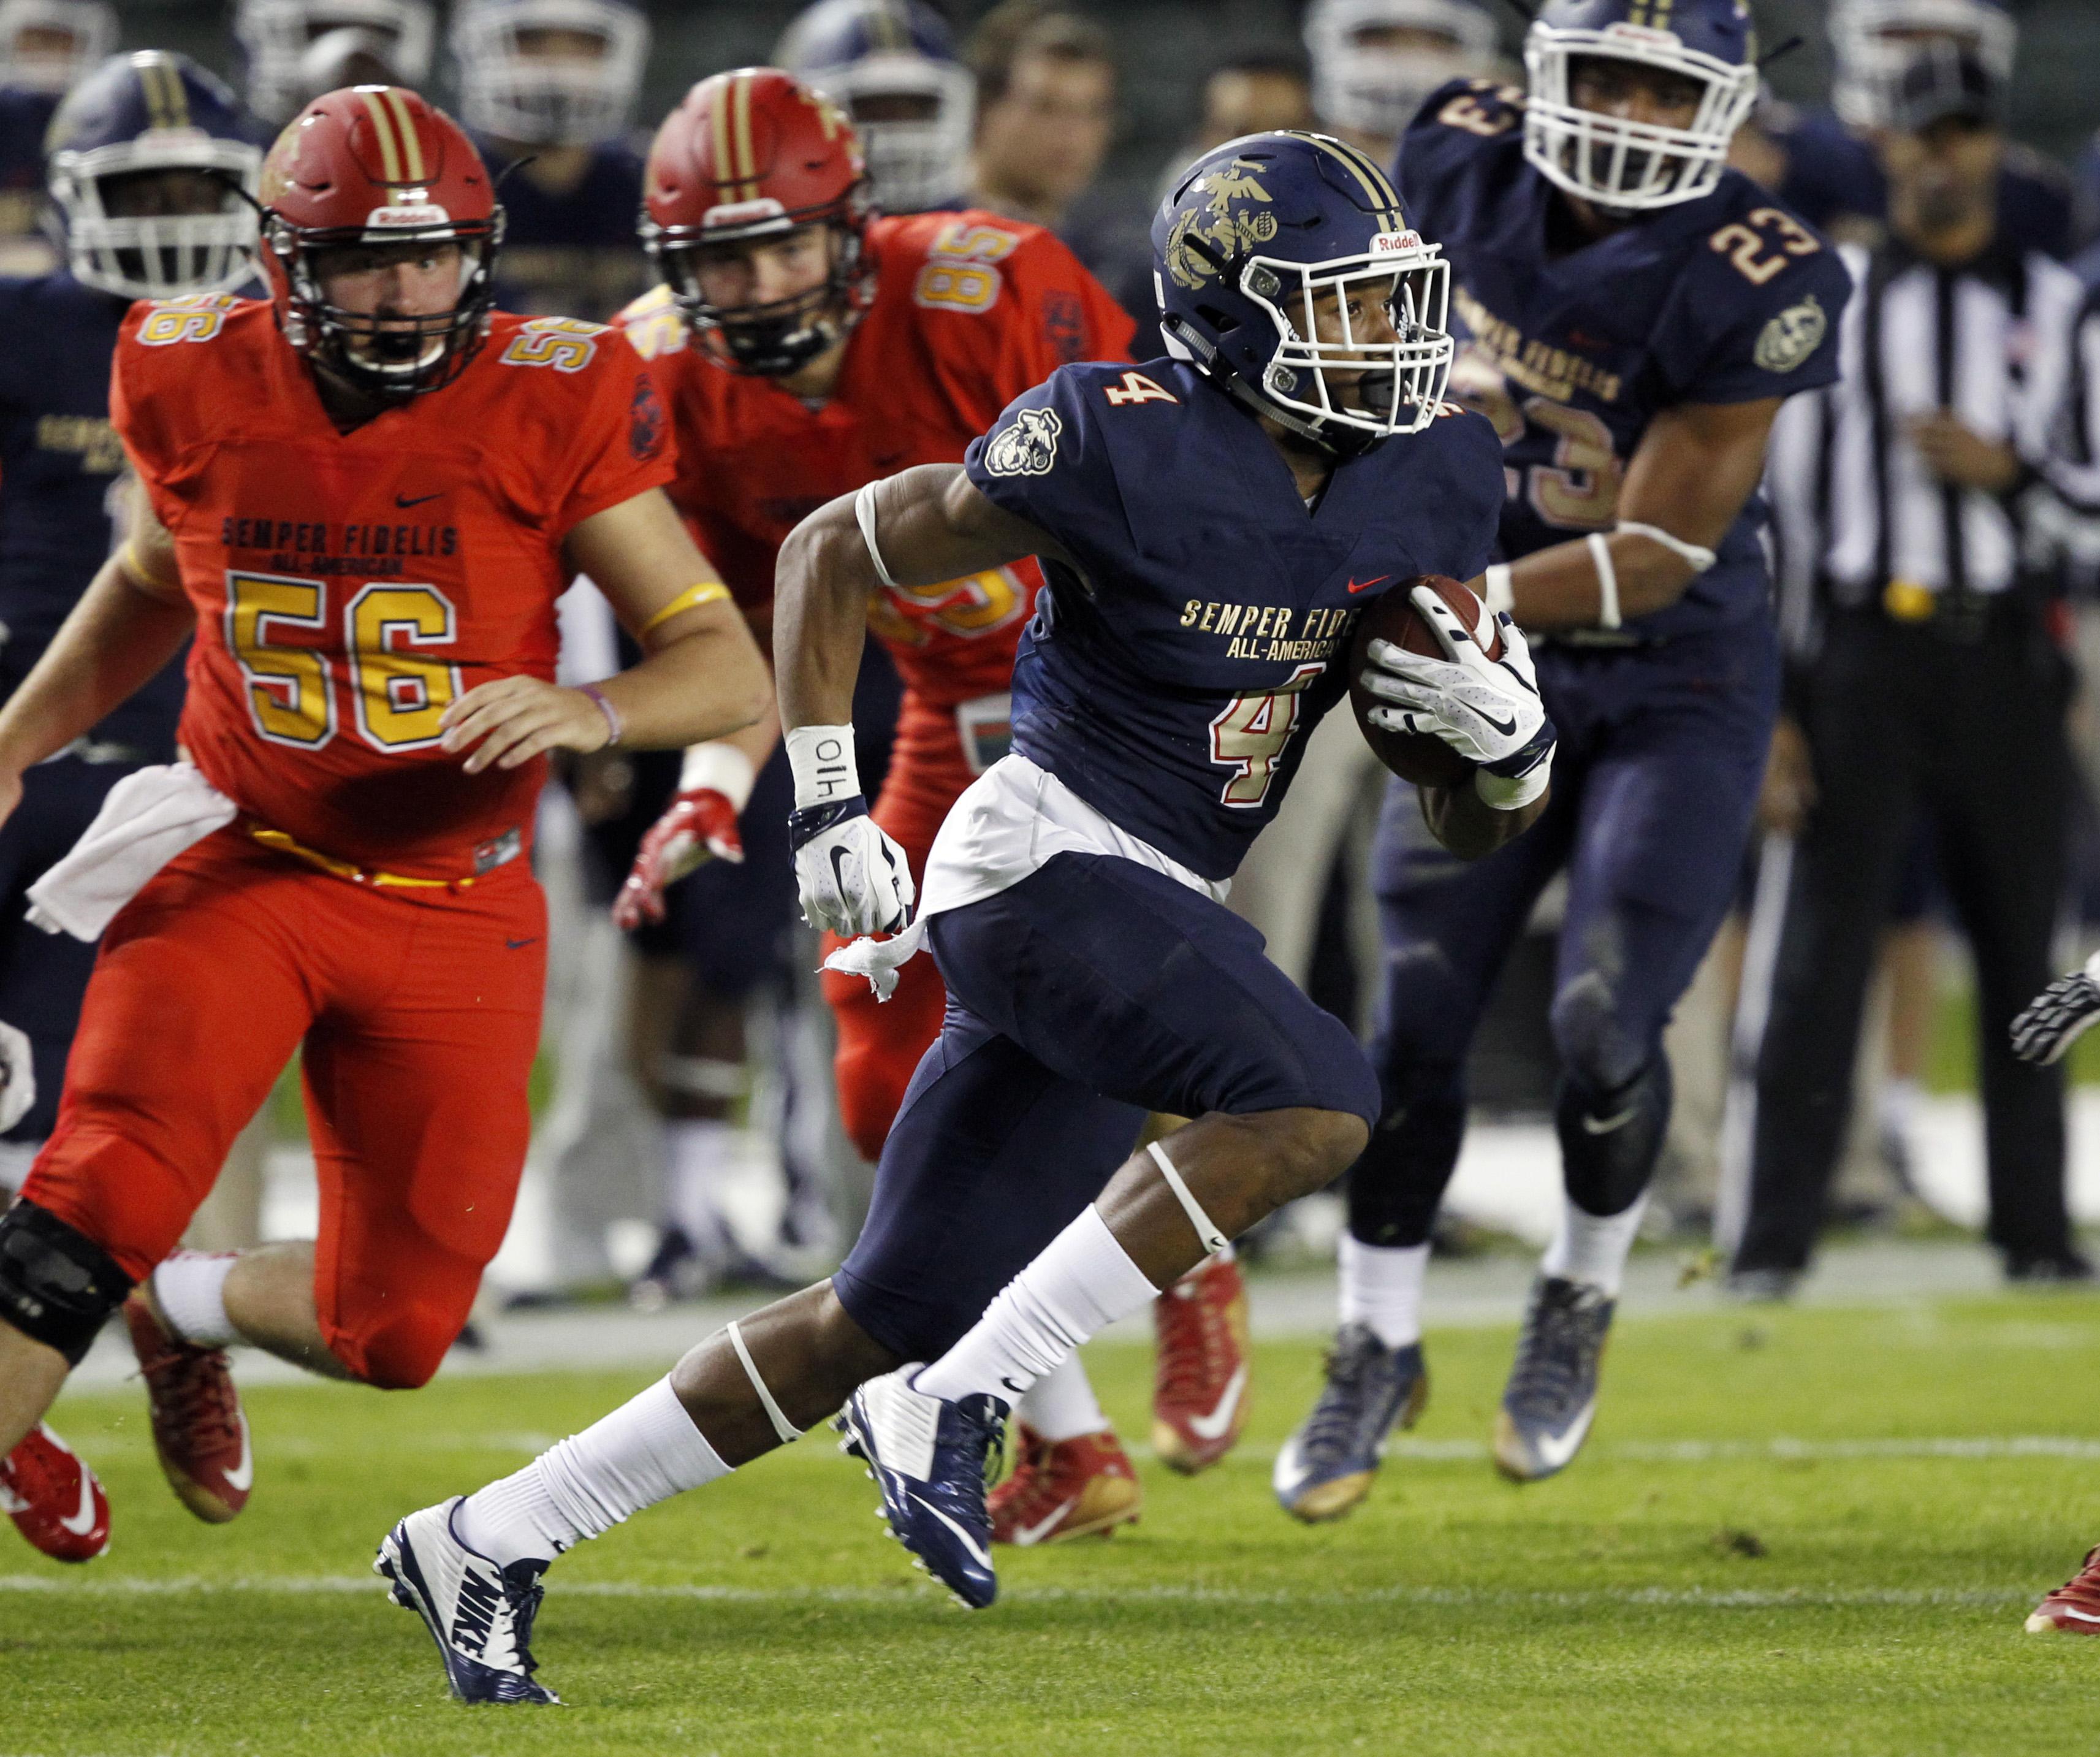 East returner Zech McPherson (4) runs a missed field goal from the end zone to the 4-yard line (Photo: Alex Gallardo, Associated Press)